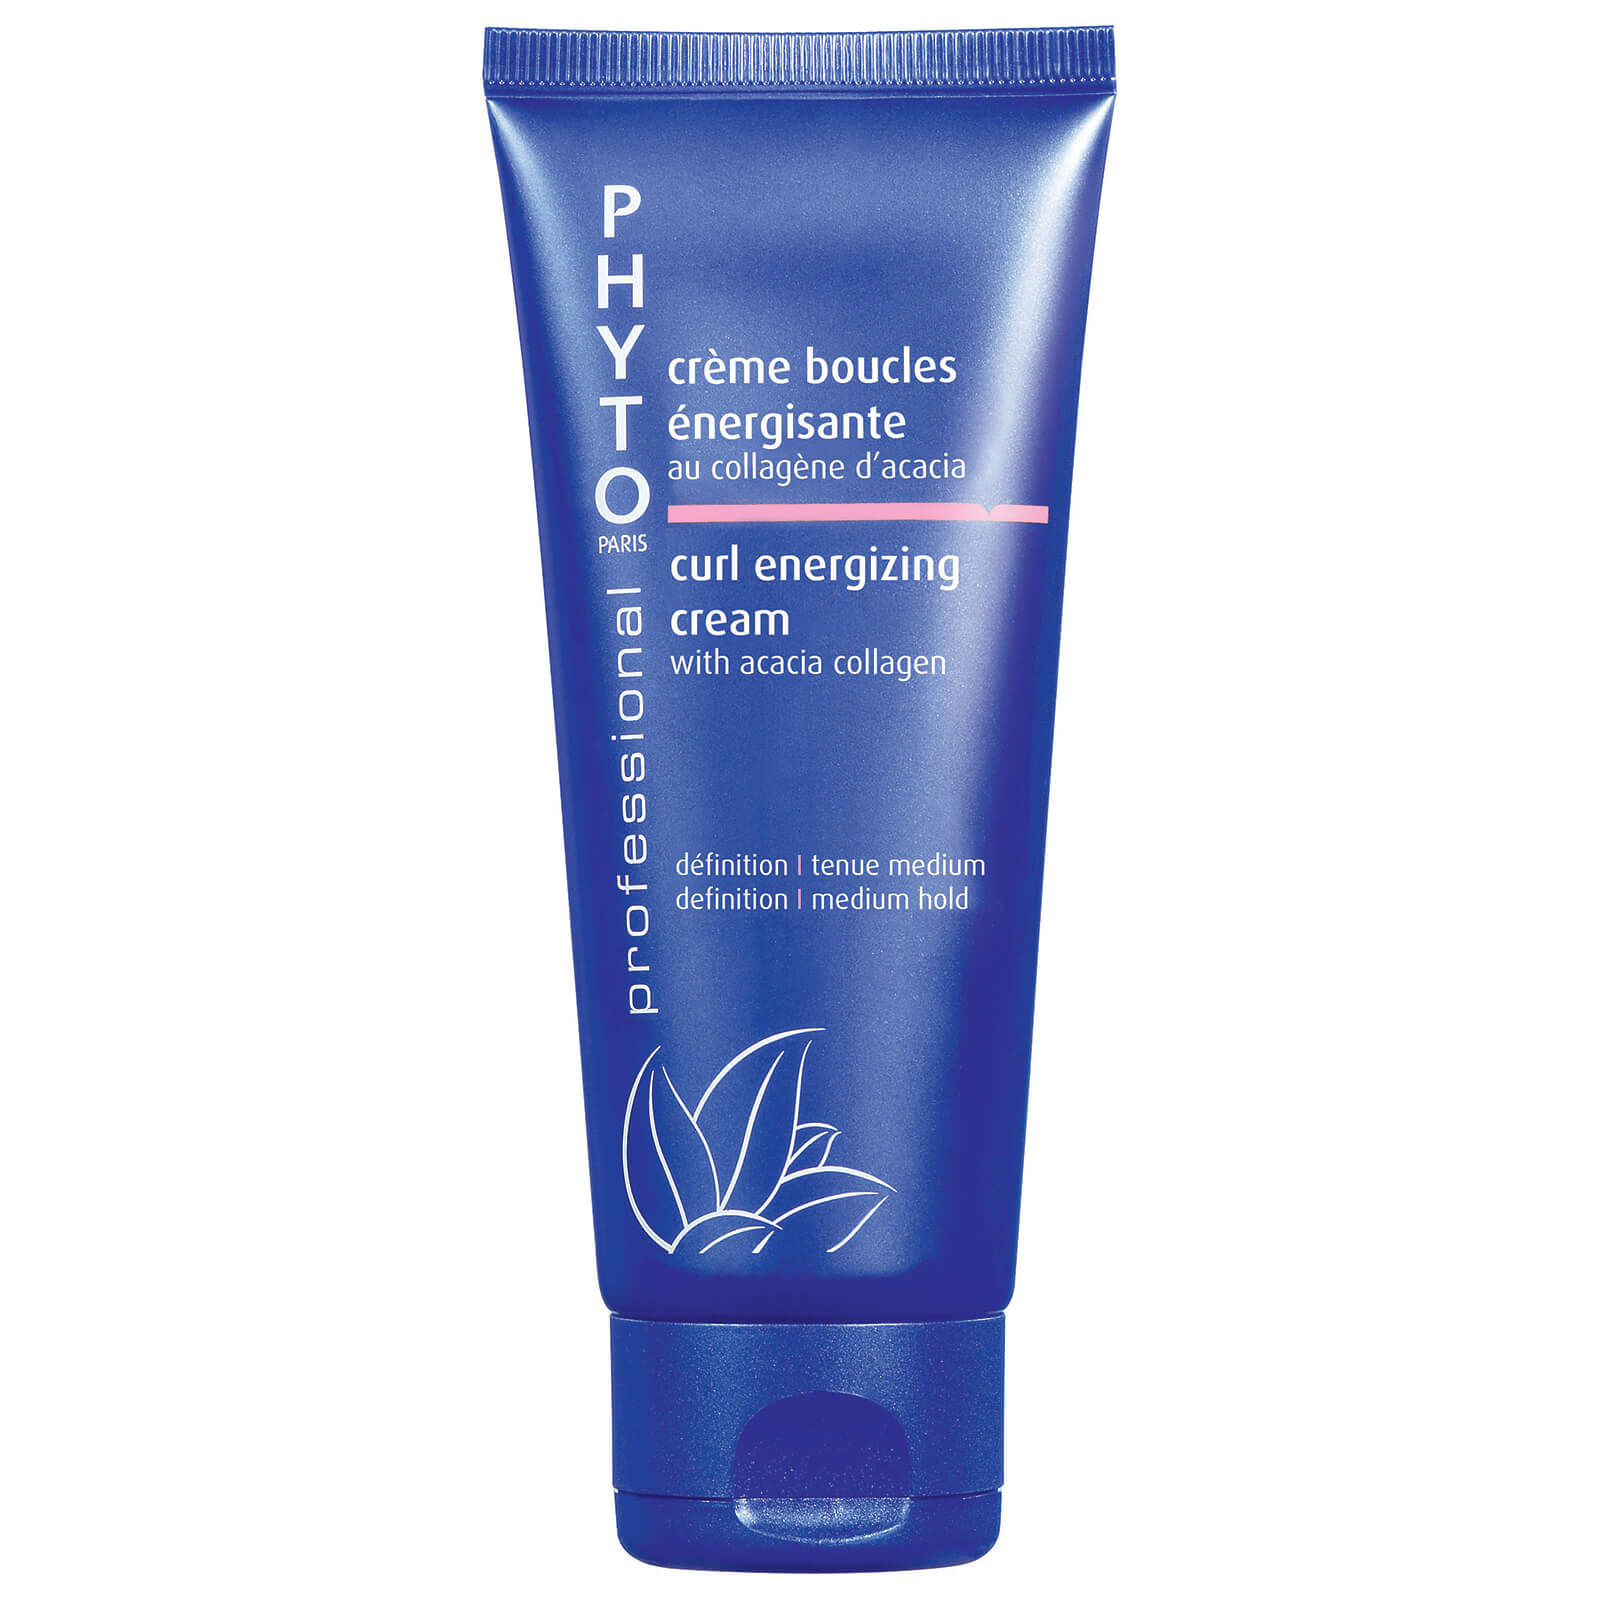 Phyto Phytocurl Curl Energising Cream 100ml Beautyexpert Austin Wedges Montana Beige Product Description